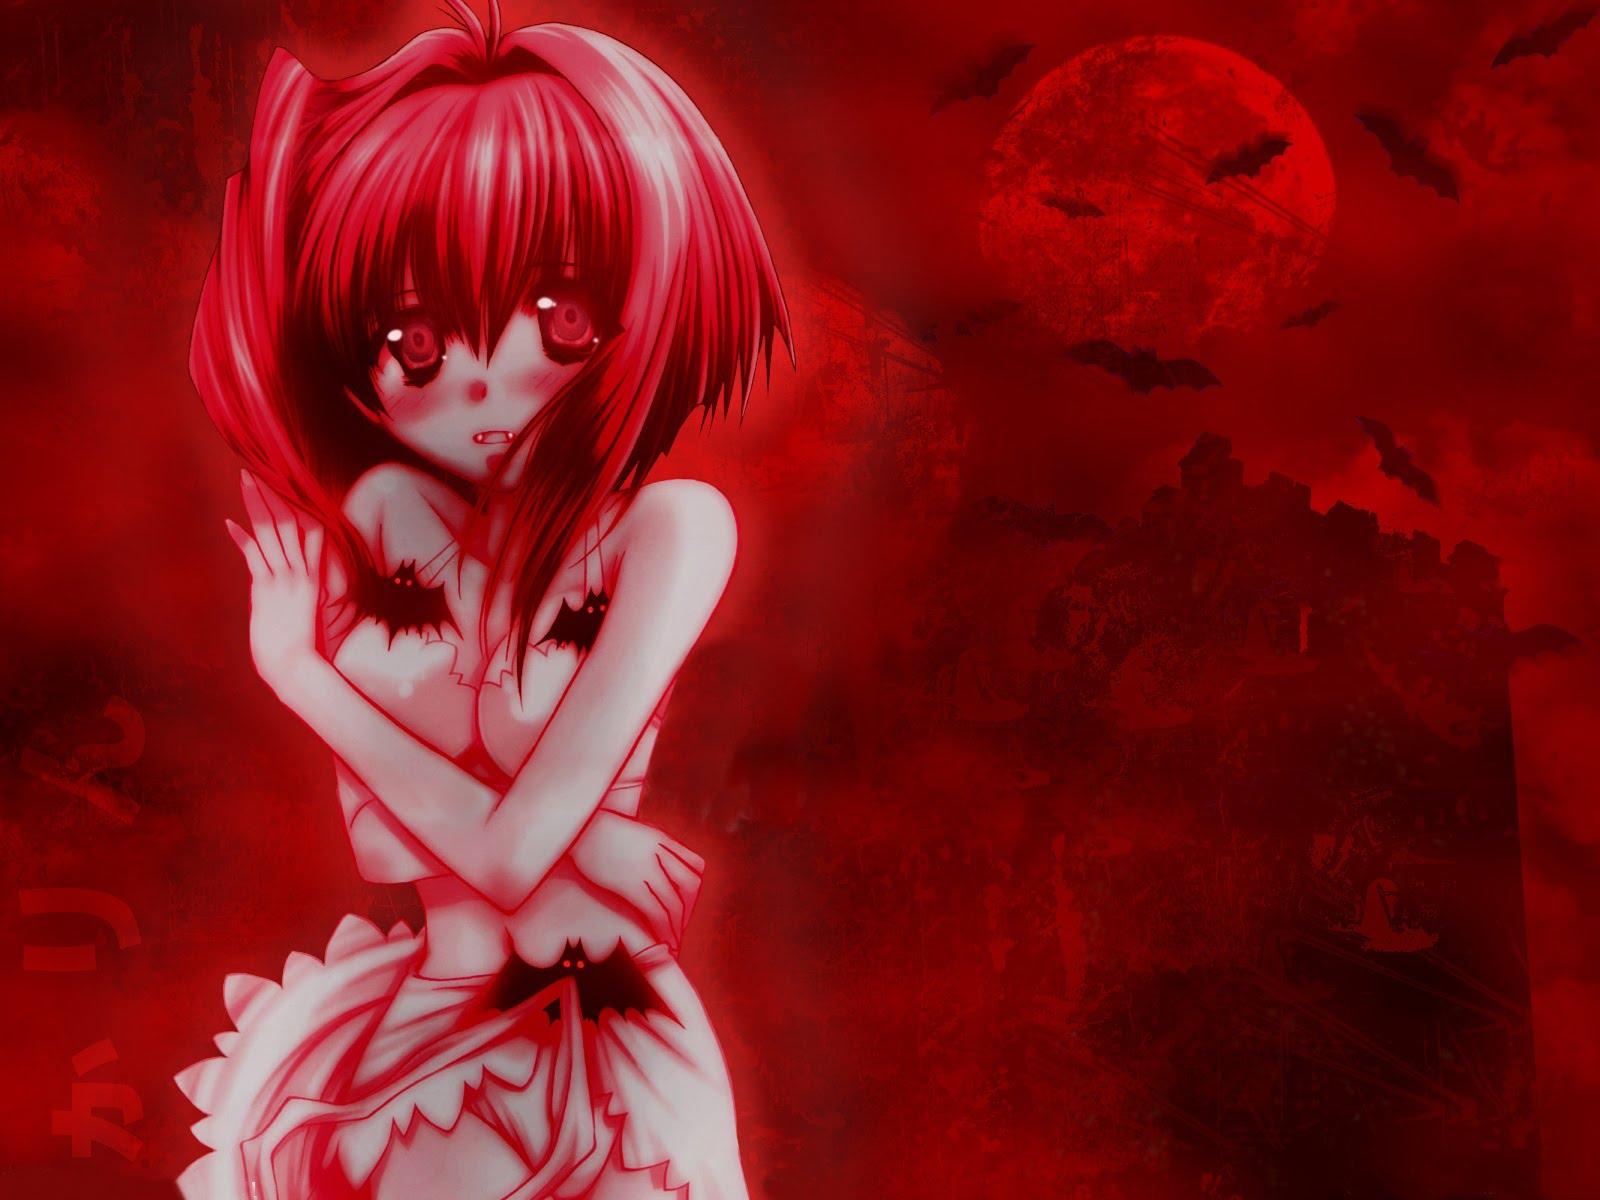 buscando vampiros y lobos Konachan.com+-+2030+blush+karin+maaka_karin+red+vampire